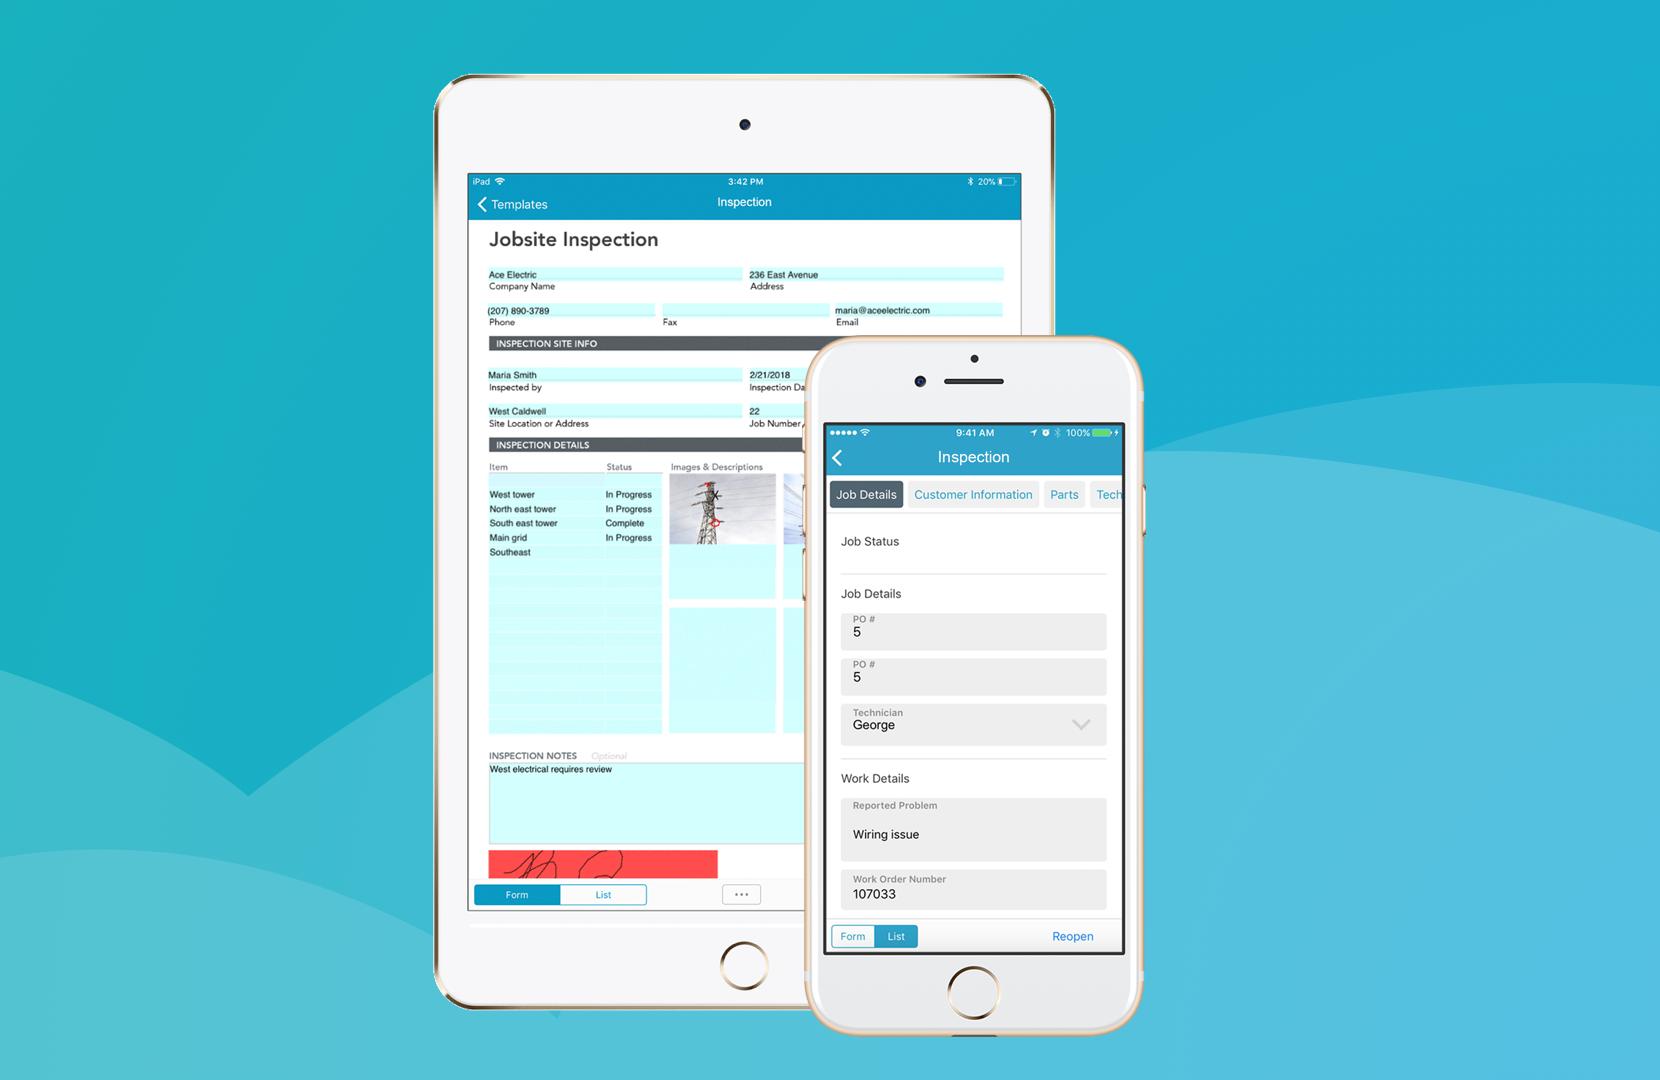 GoFormz mobile forms streamline and simplify your workflow